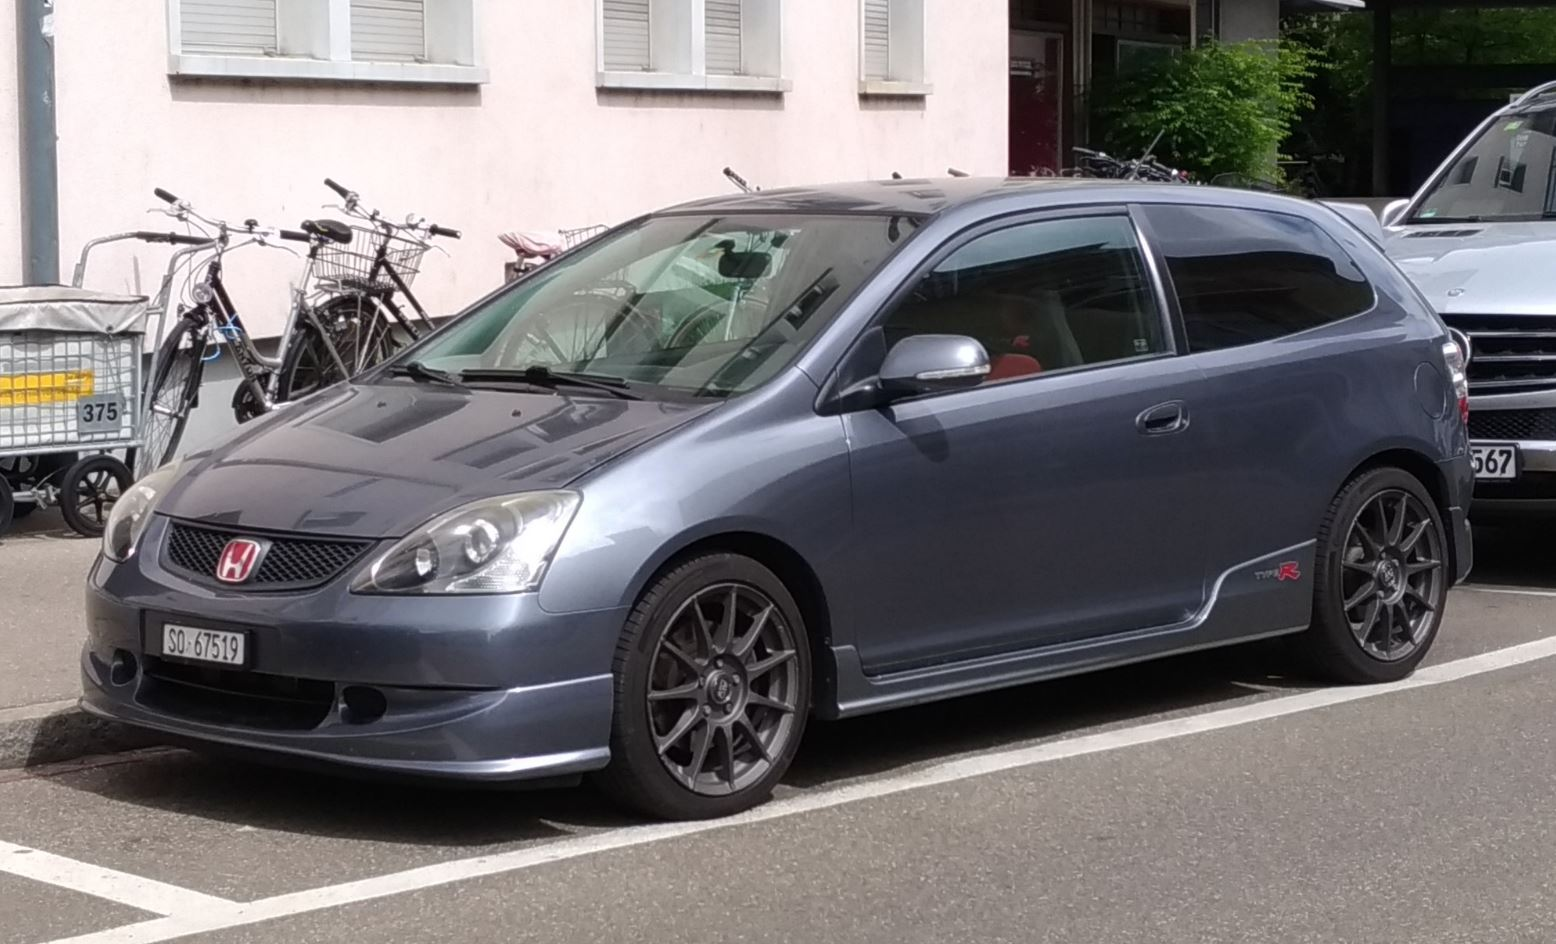 Honda Civic Type R EP3 Buying Guide & History - Garage Dreams